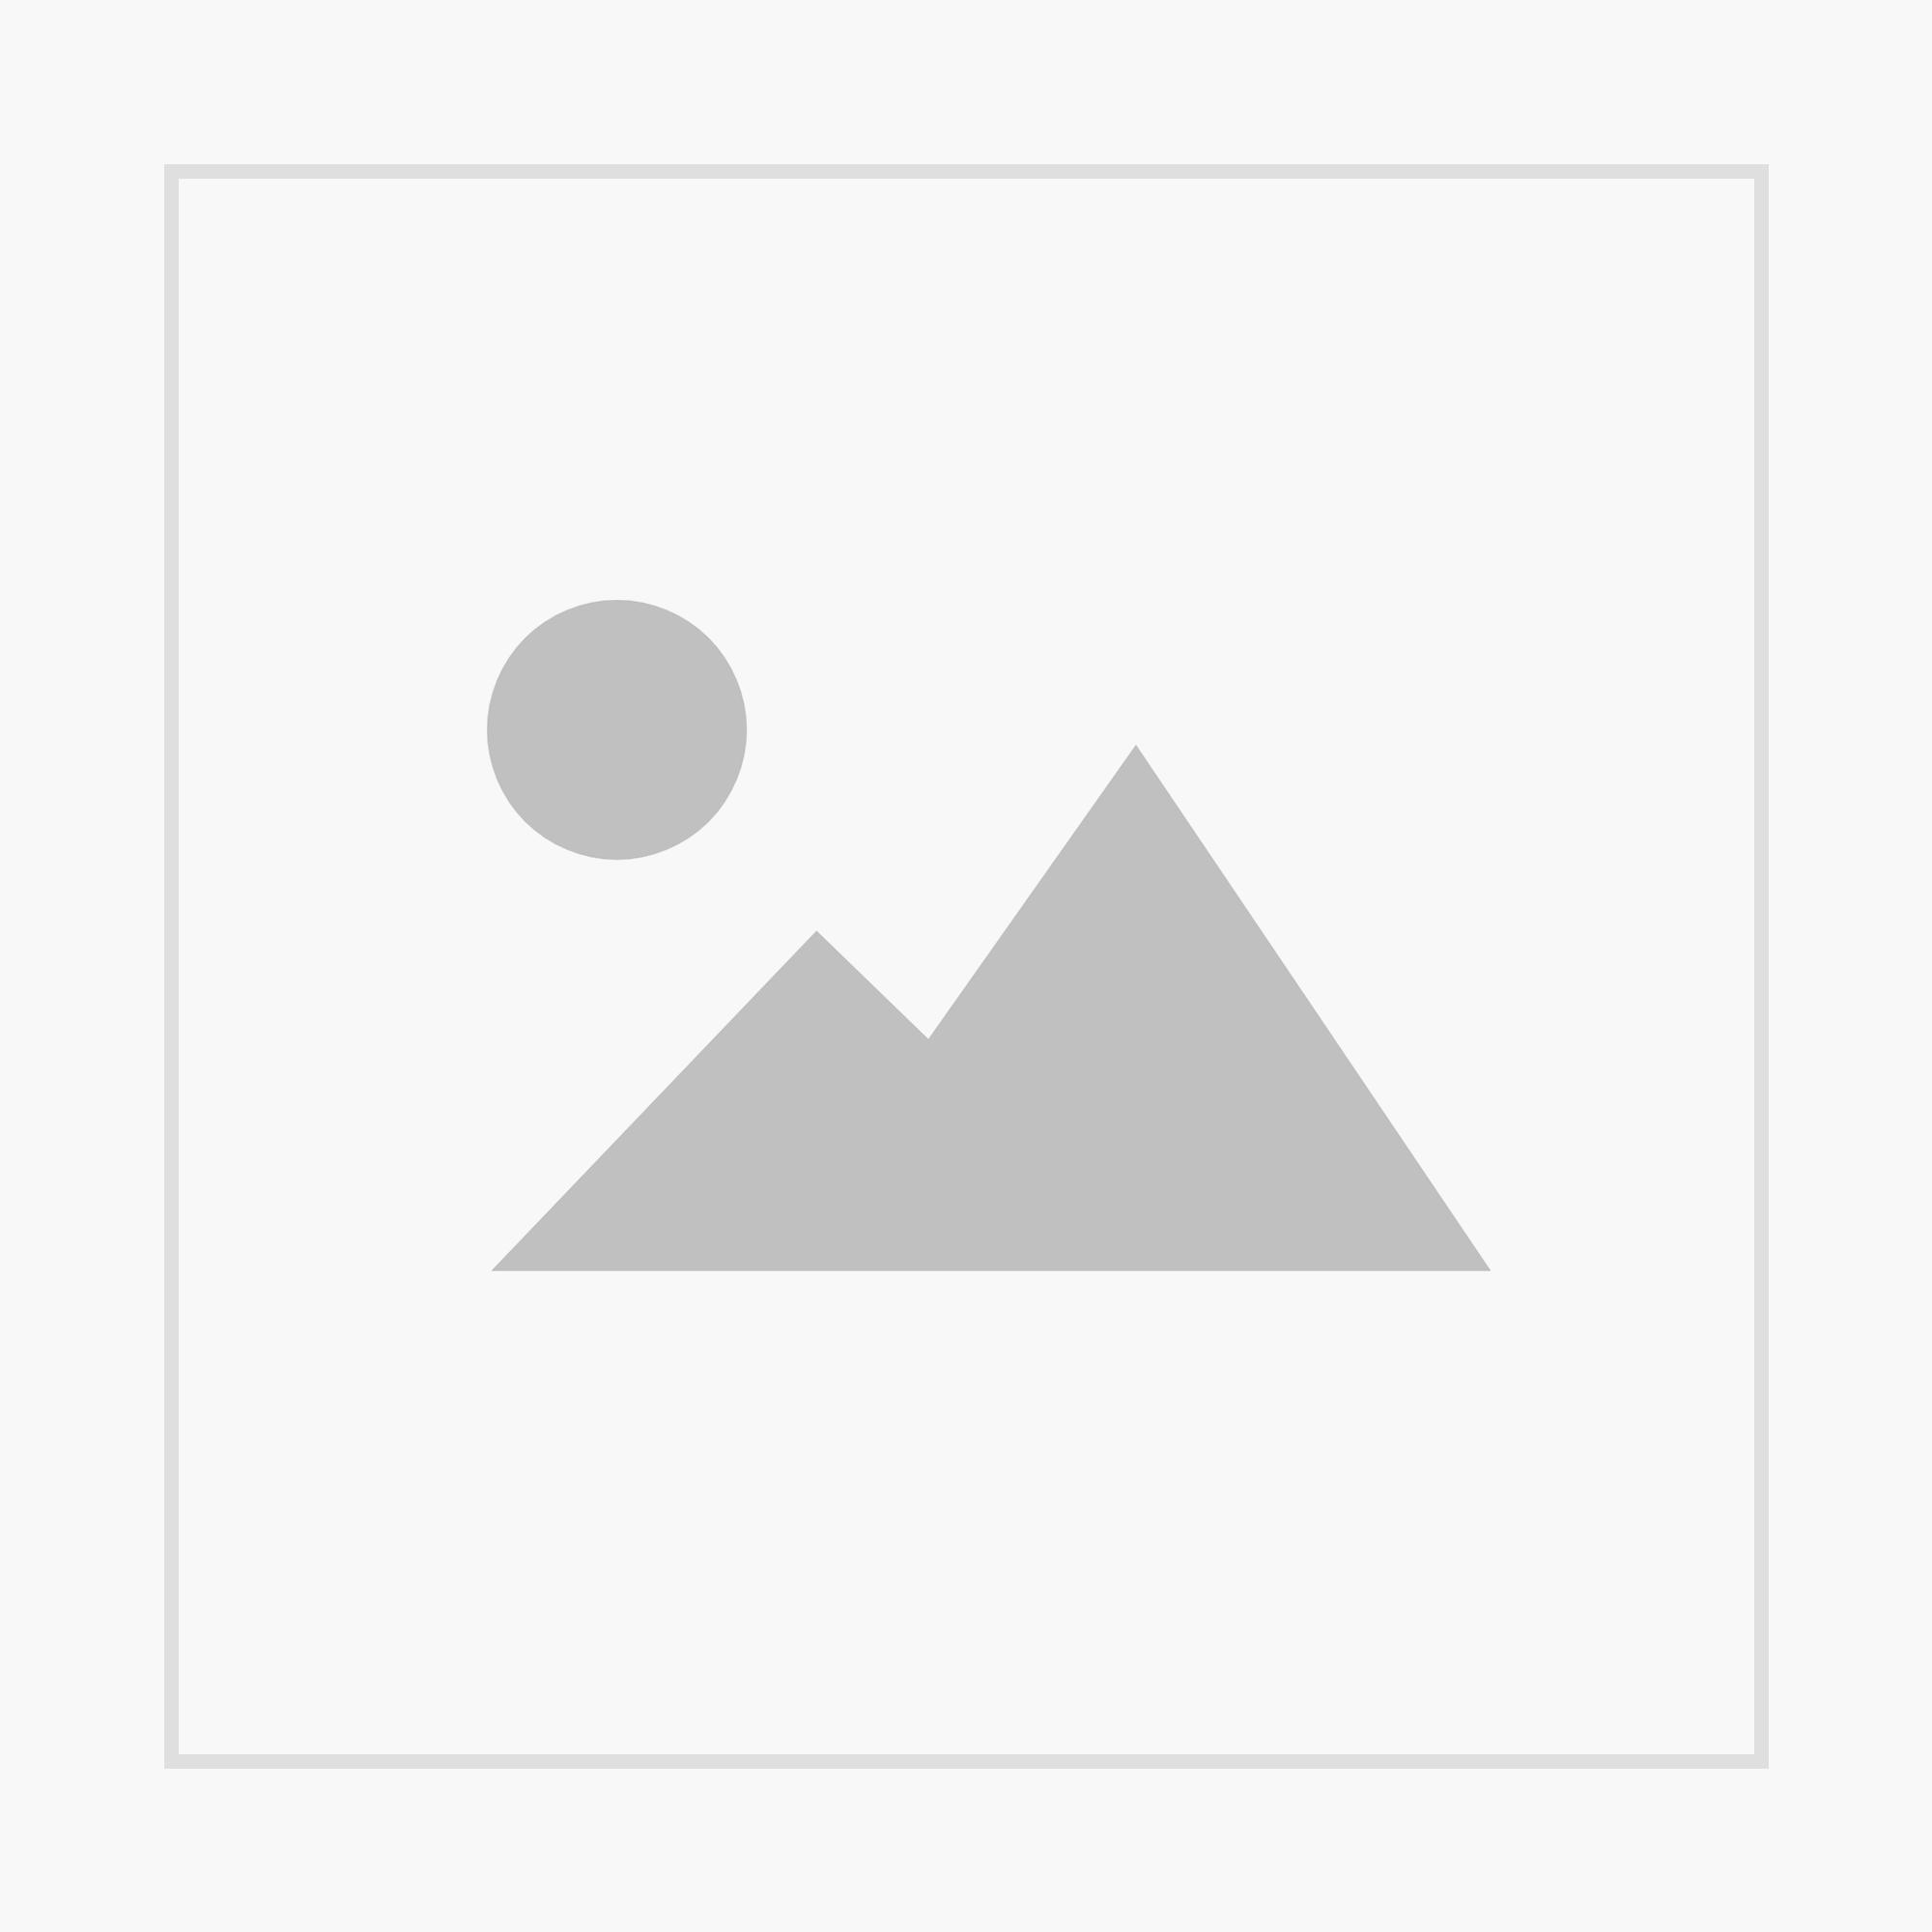 Stark 03/19